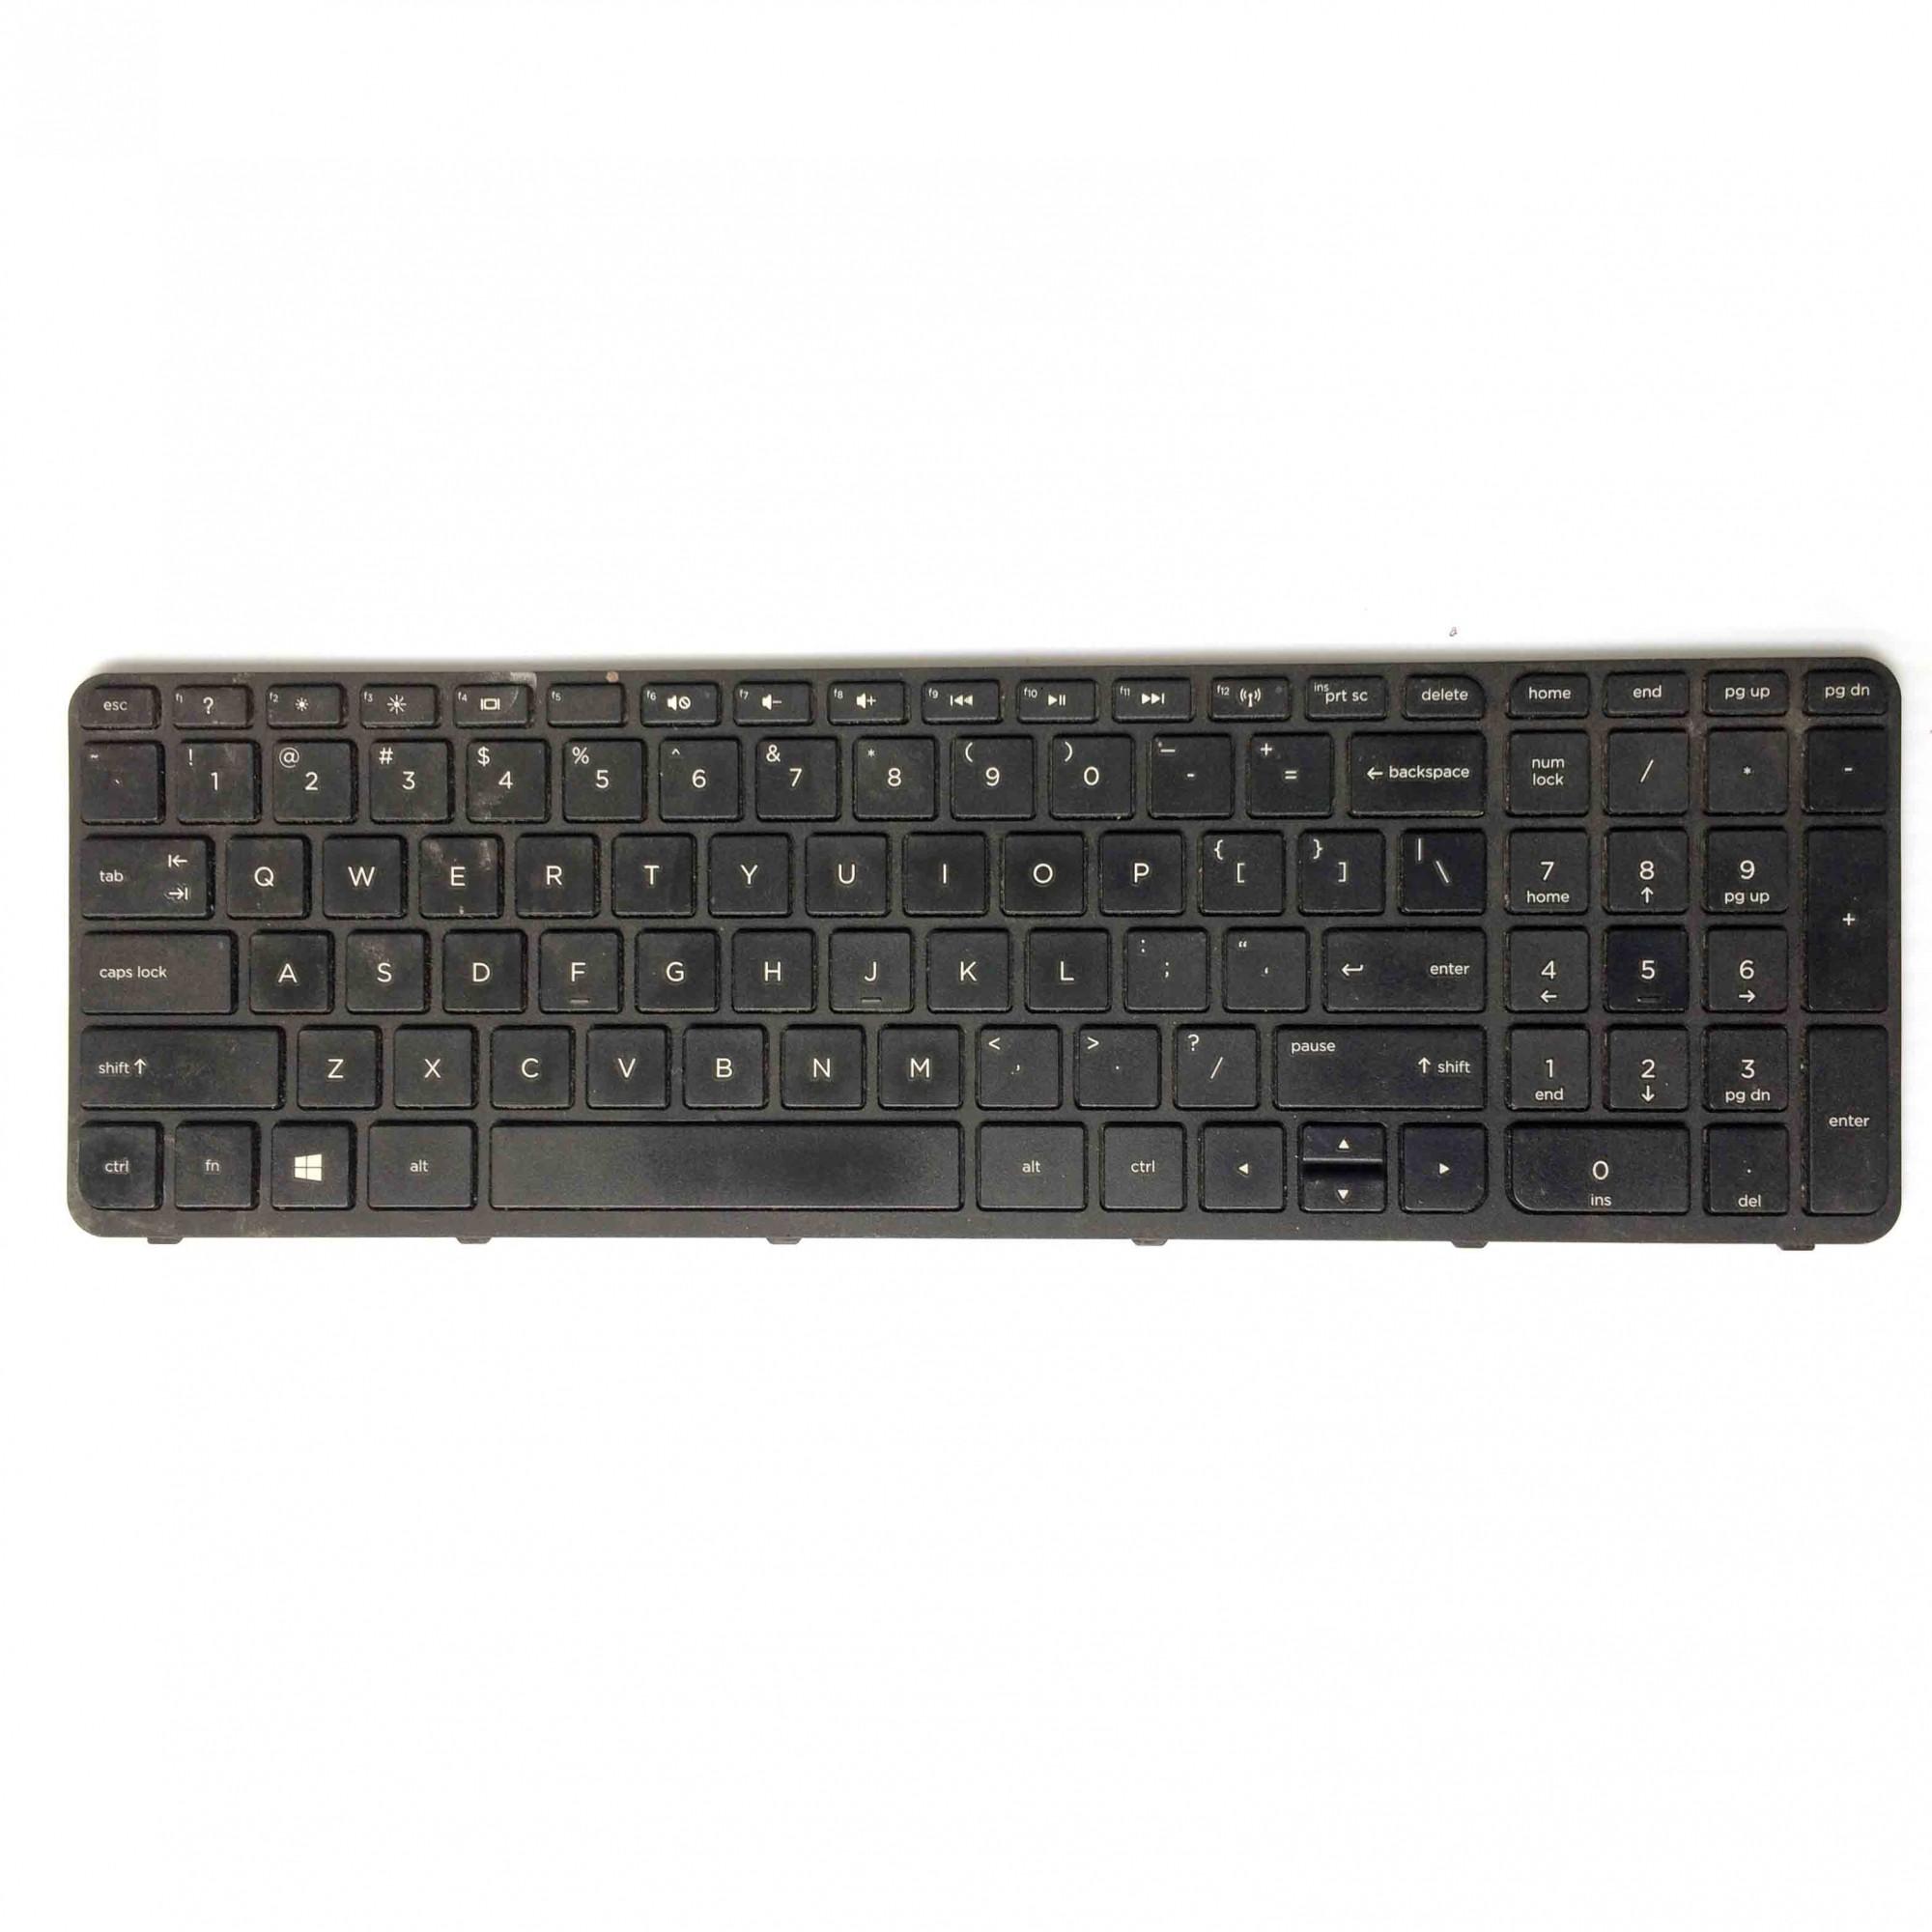 Teclado + Flat Notebook HP Pavilion 15-E020TX PN:pk1314d4a00 - Retirado